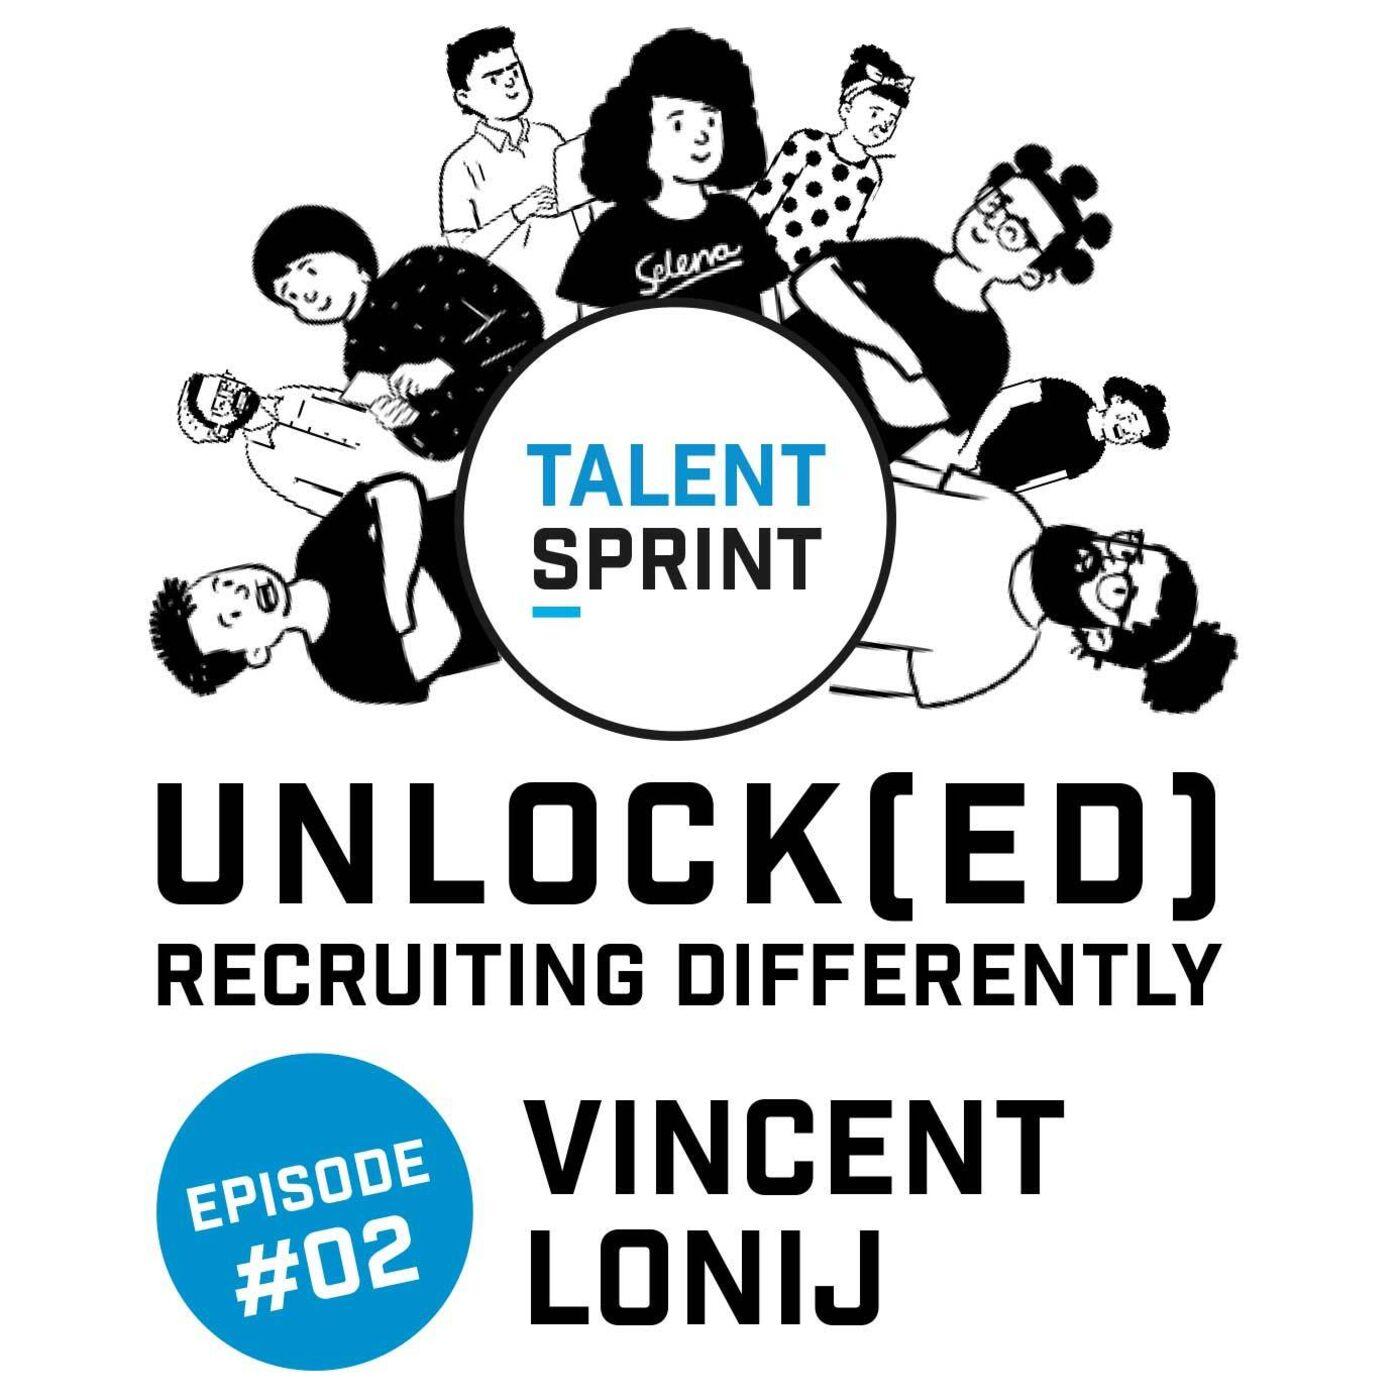 Episode 2 - Unlock(ed) with Vincent Lonij